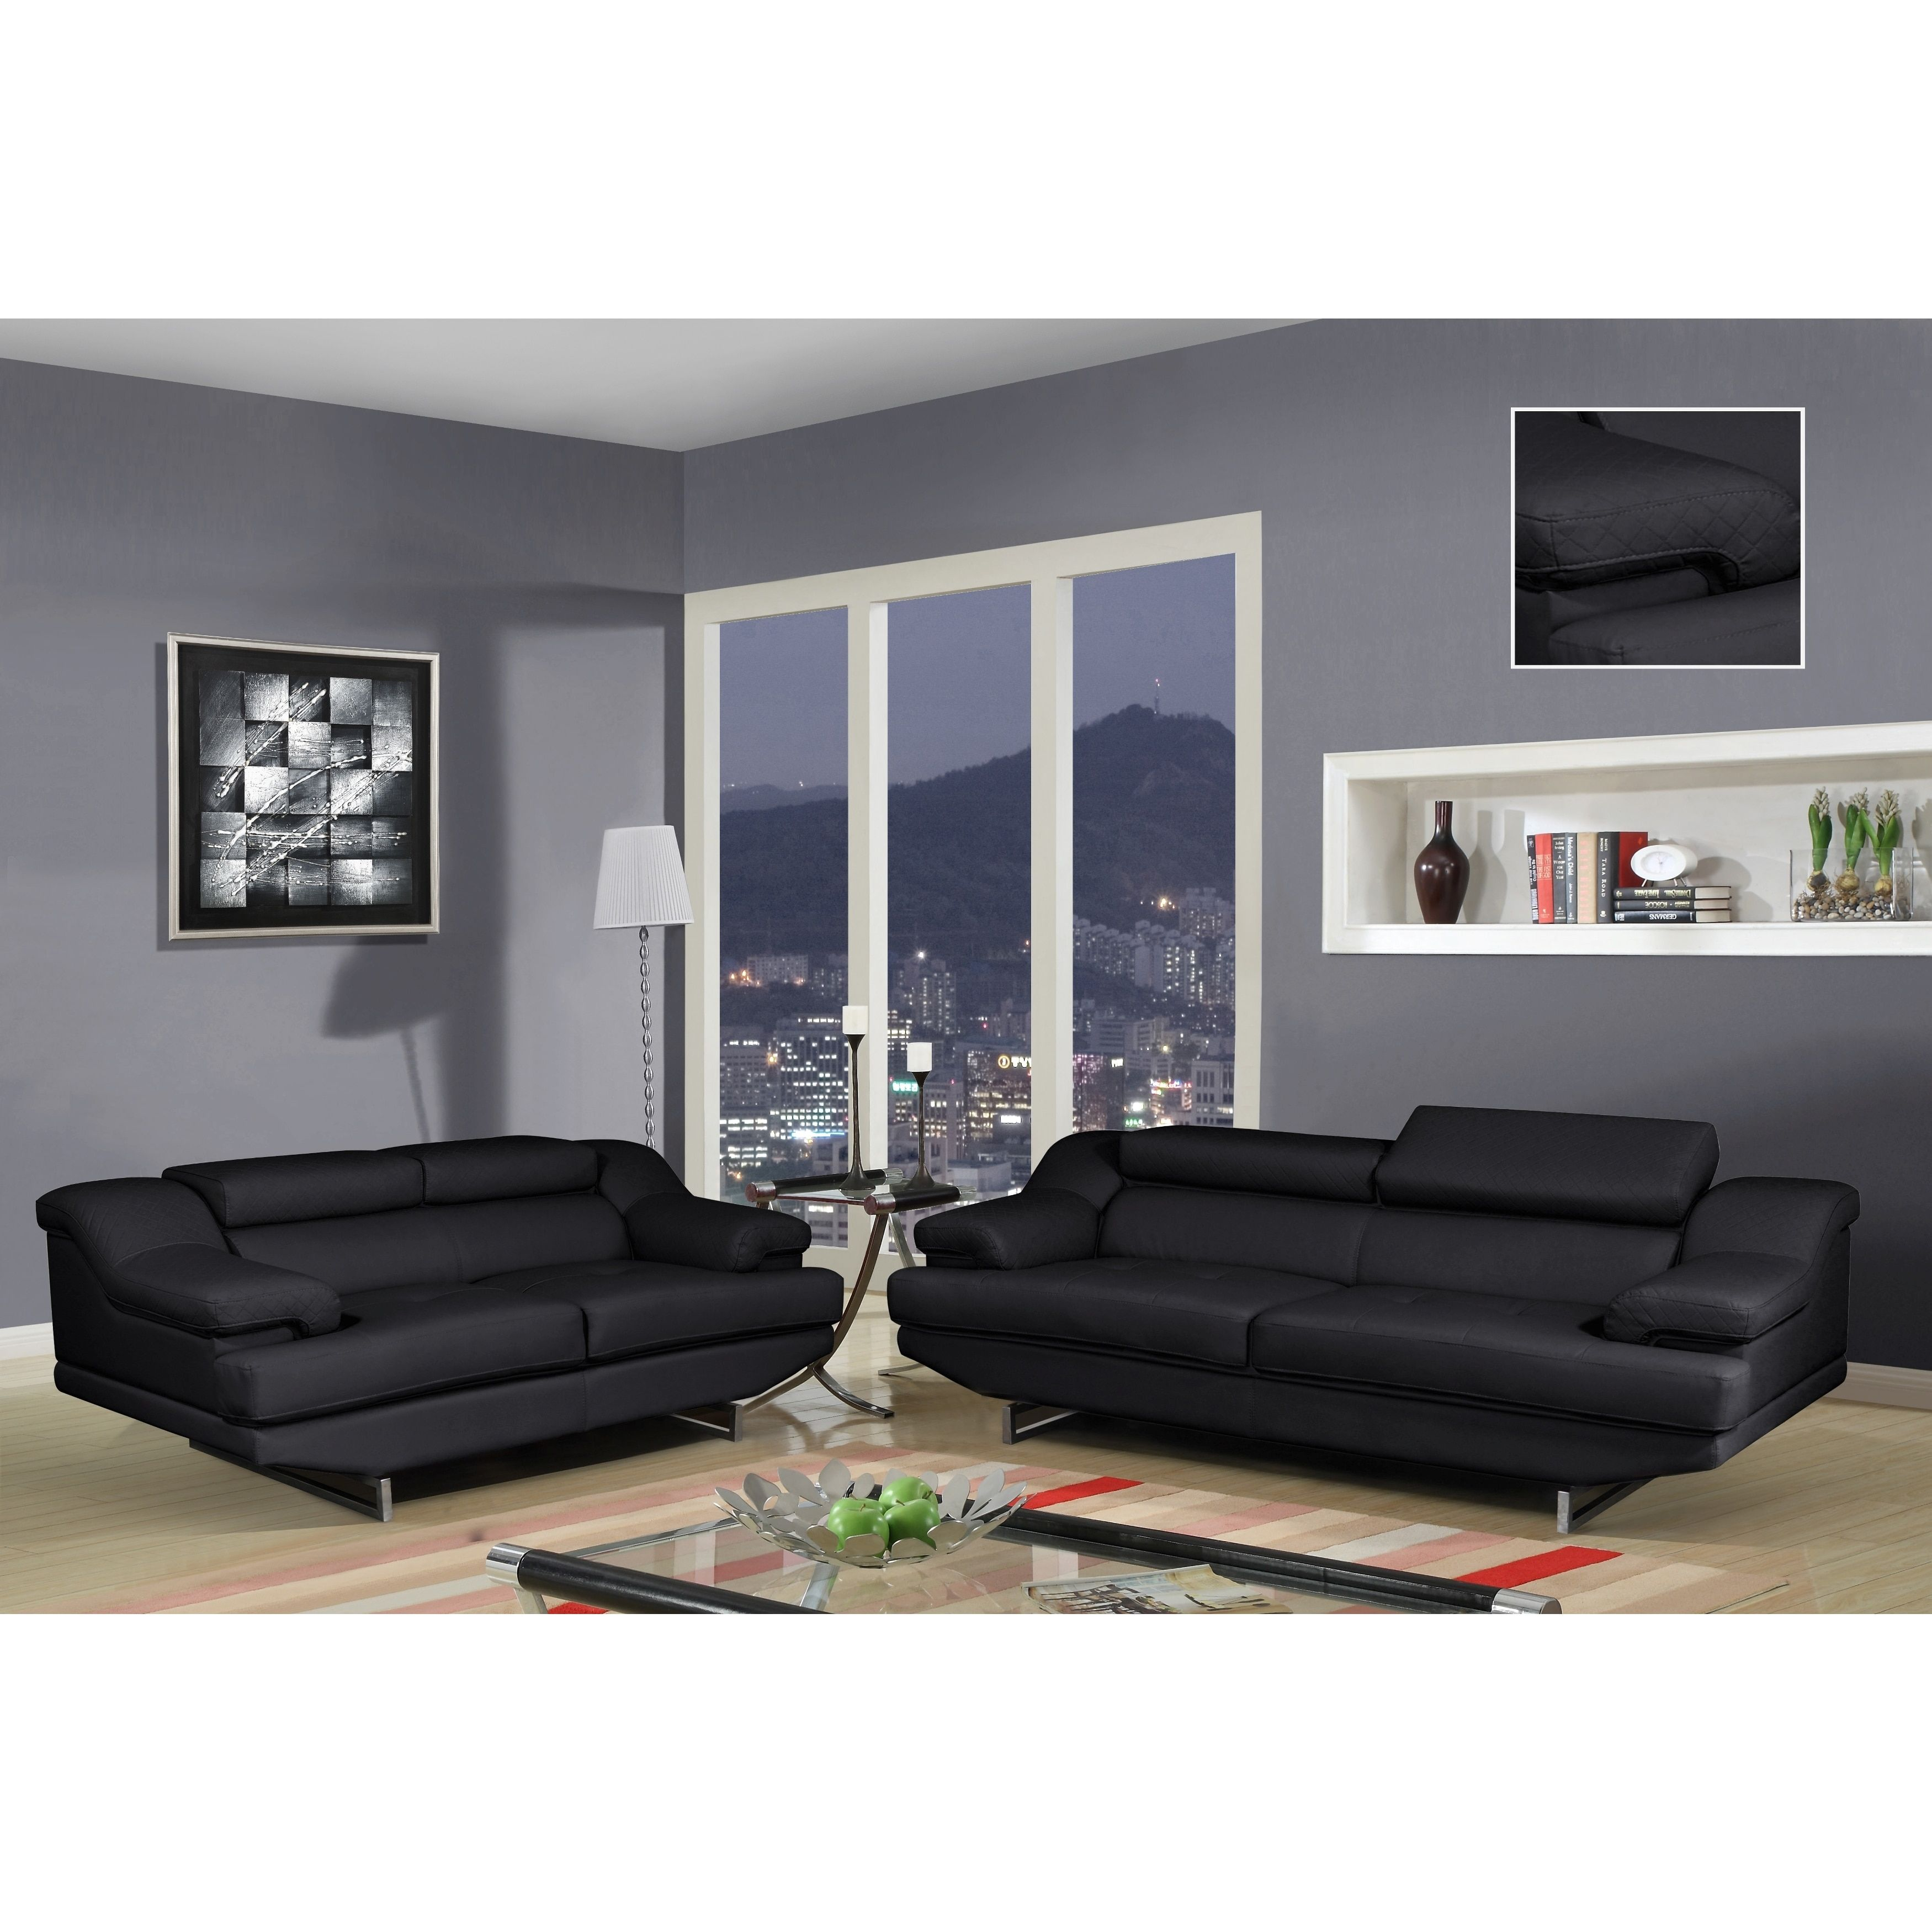 Natalie Black Wagner Black Sofa